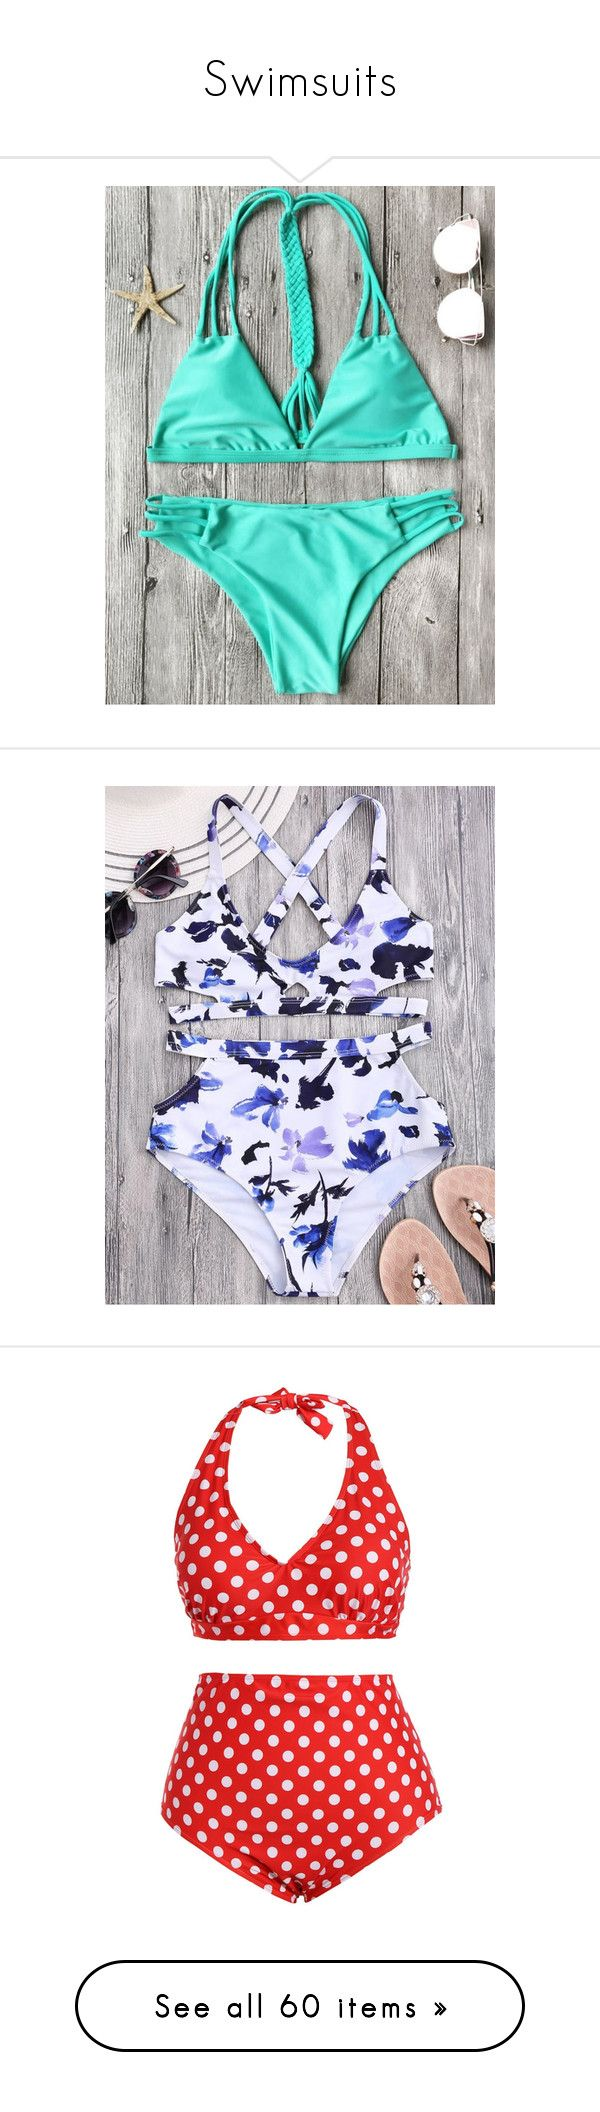 """Swimsuits"" by stephiebear123 ❤ liked on Polyvore featuring swimwear, bikinis, women's plus size swimwear, bikini swimwear, pin up bikini, halter top, plus size bikini, triangle bikinis, triangle swimwear and floral bikini"